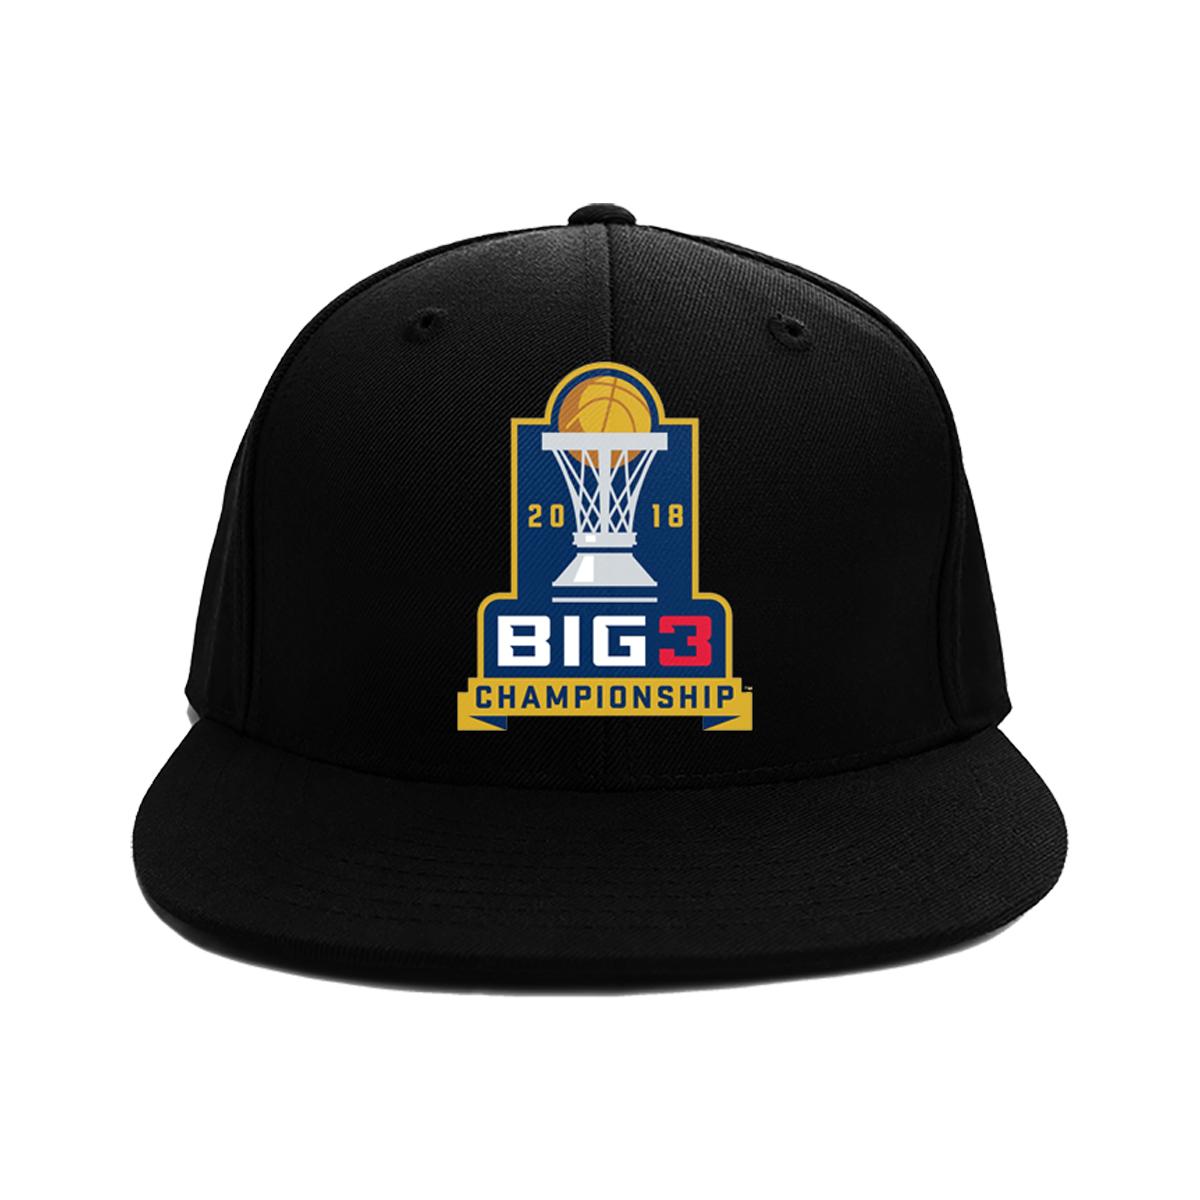 Big3 2018 Championship Hat